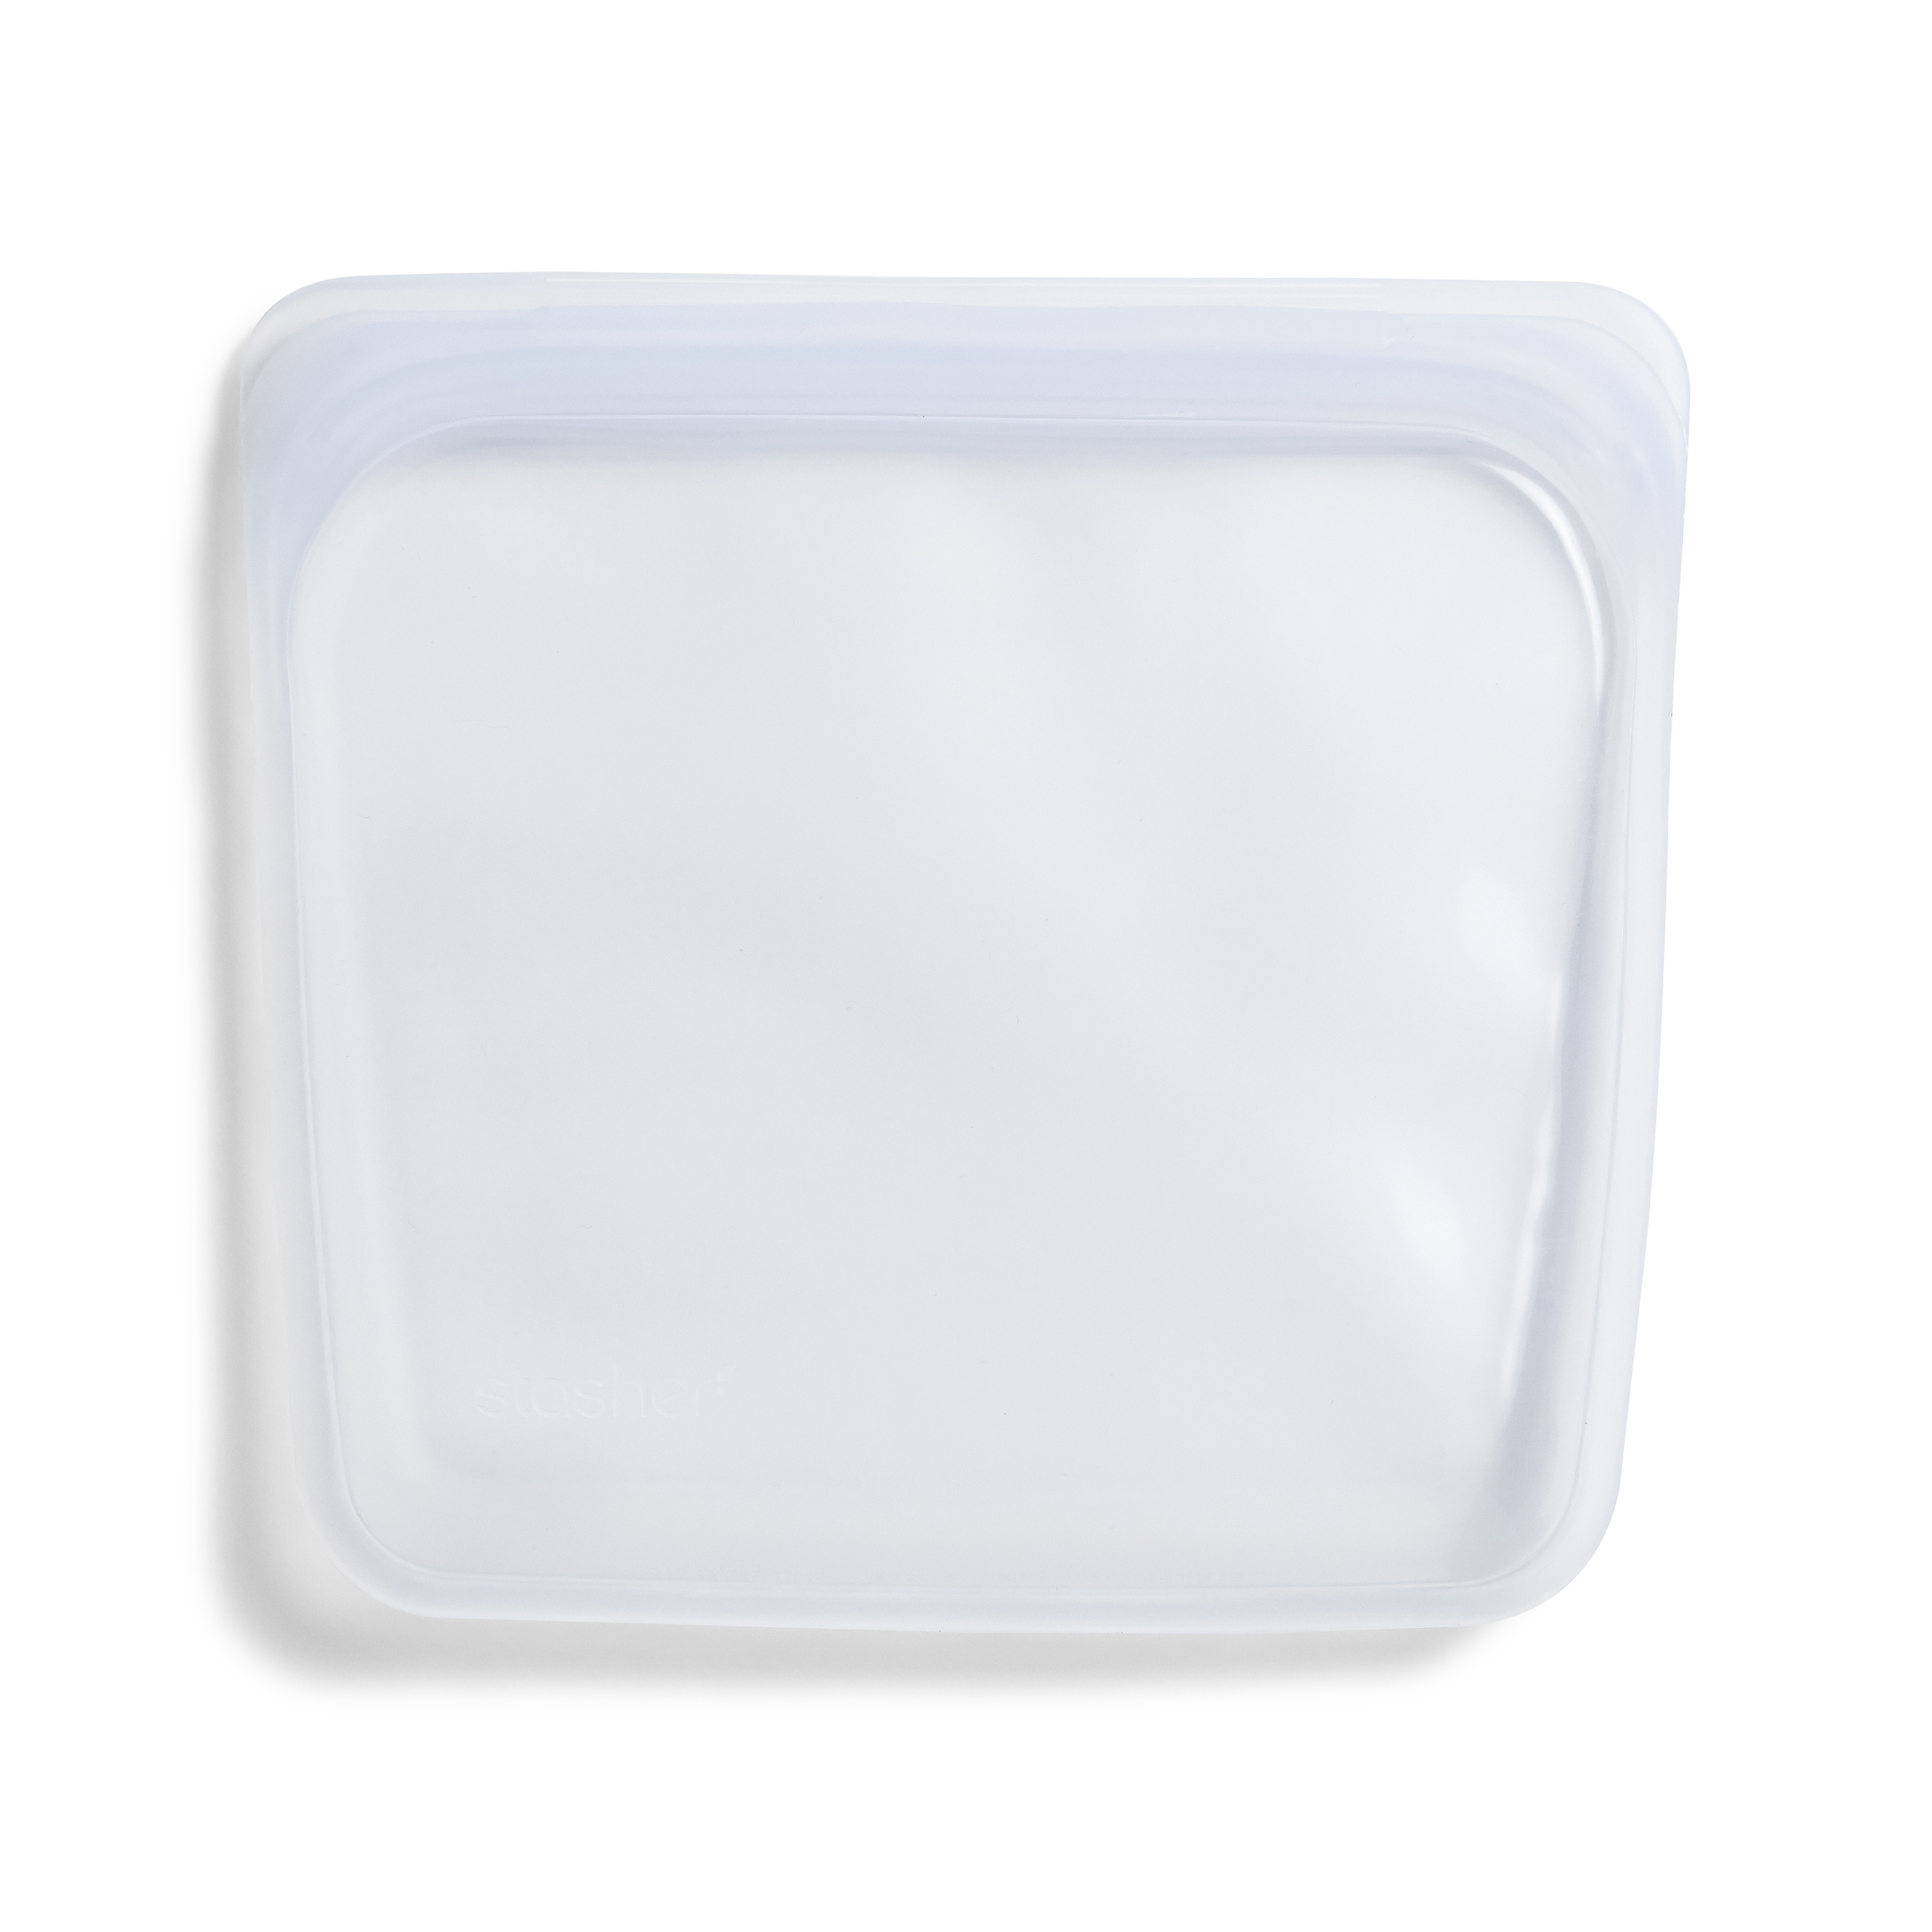 Stasher Sandwich genanvendelig pose, 18x19 cm, klar